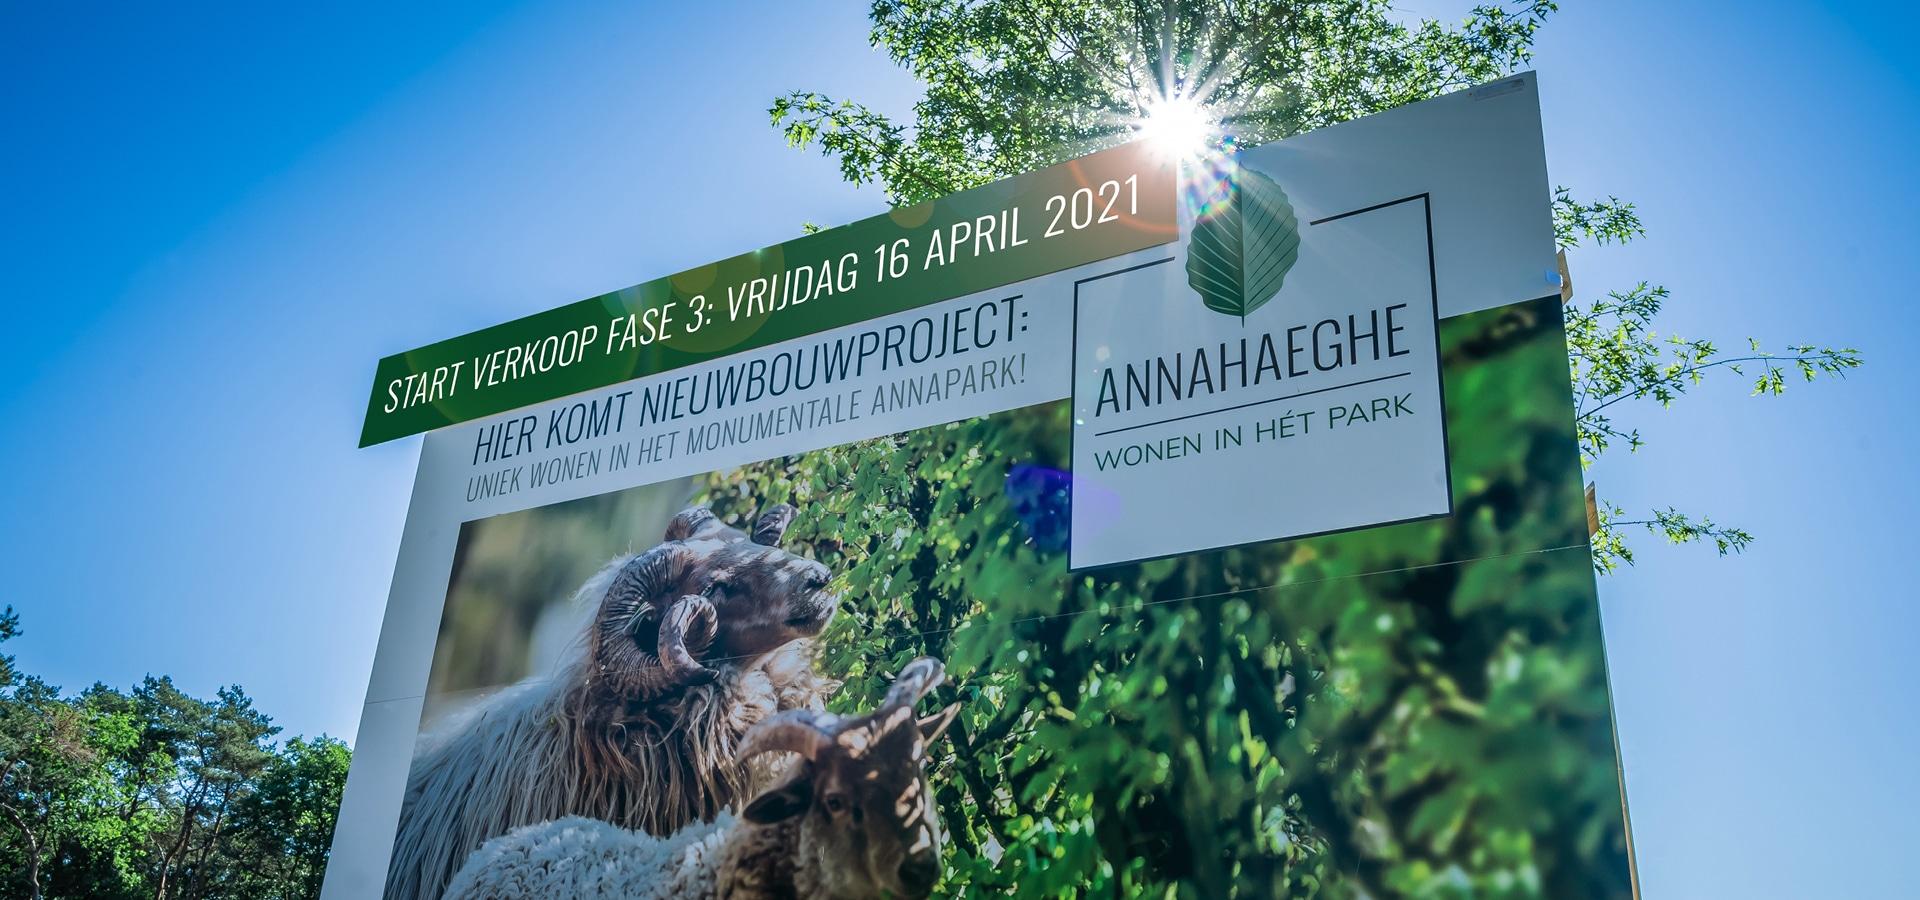 Start verkoop Annahaeghe fase 3: vrijdag 16 april 2021